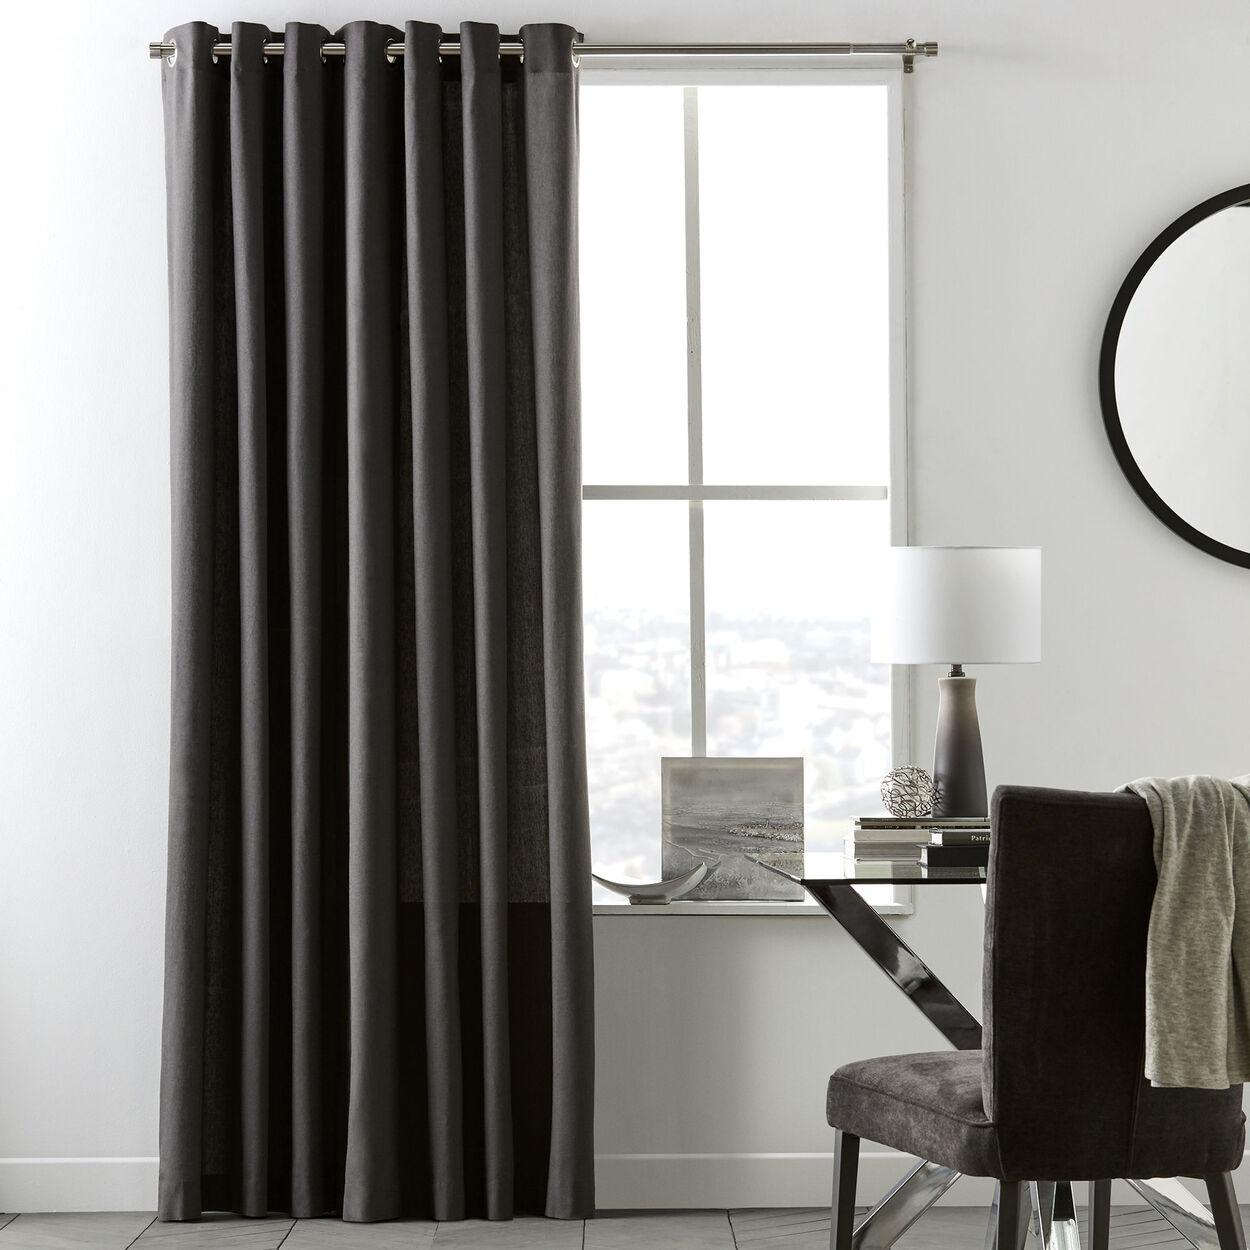 Naturia Recycled Fabric Curtain